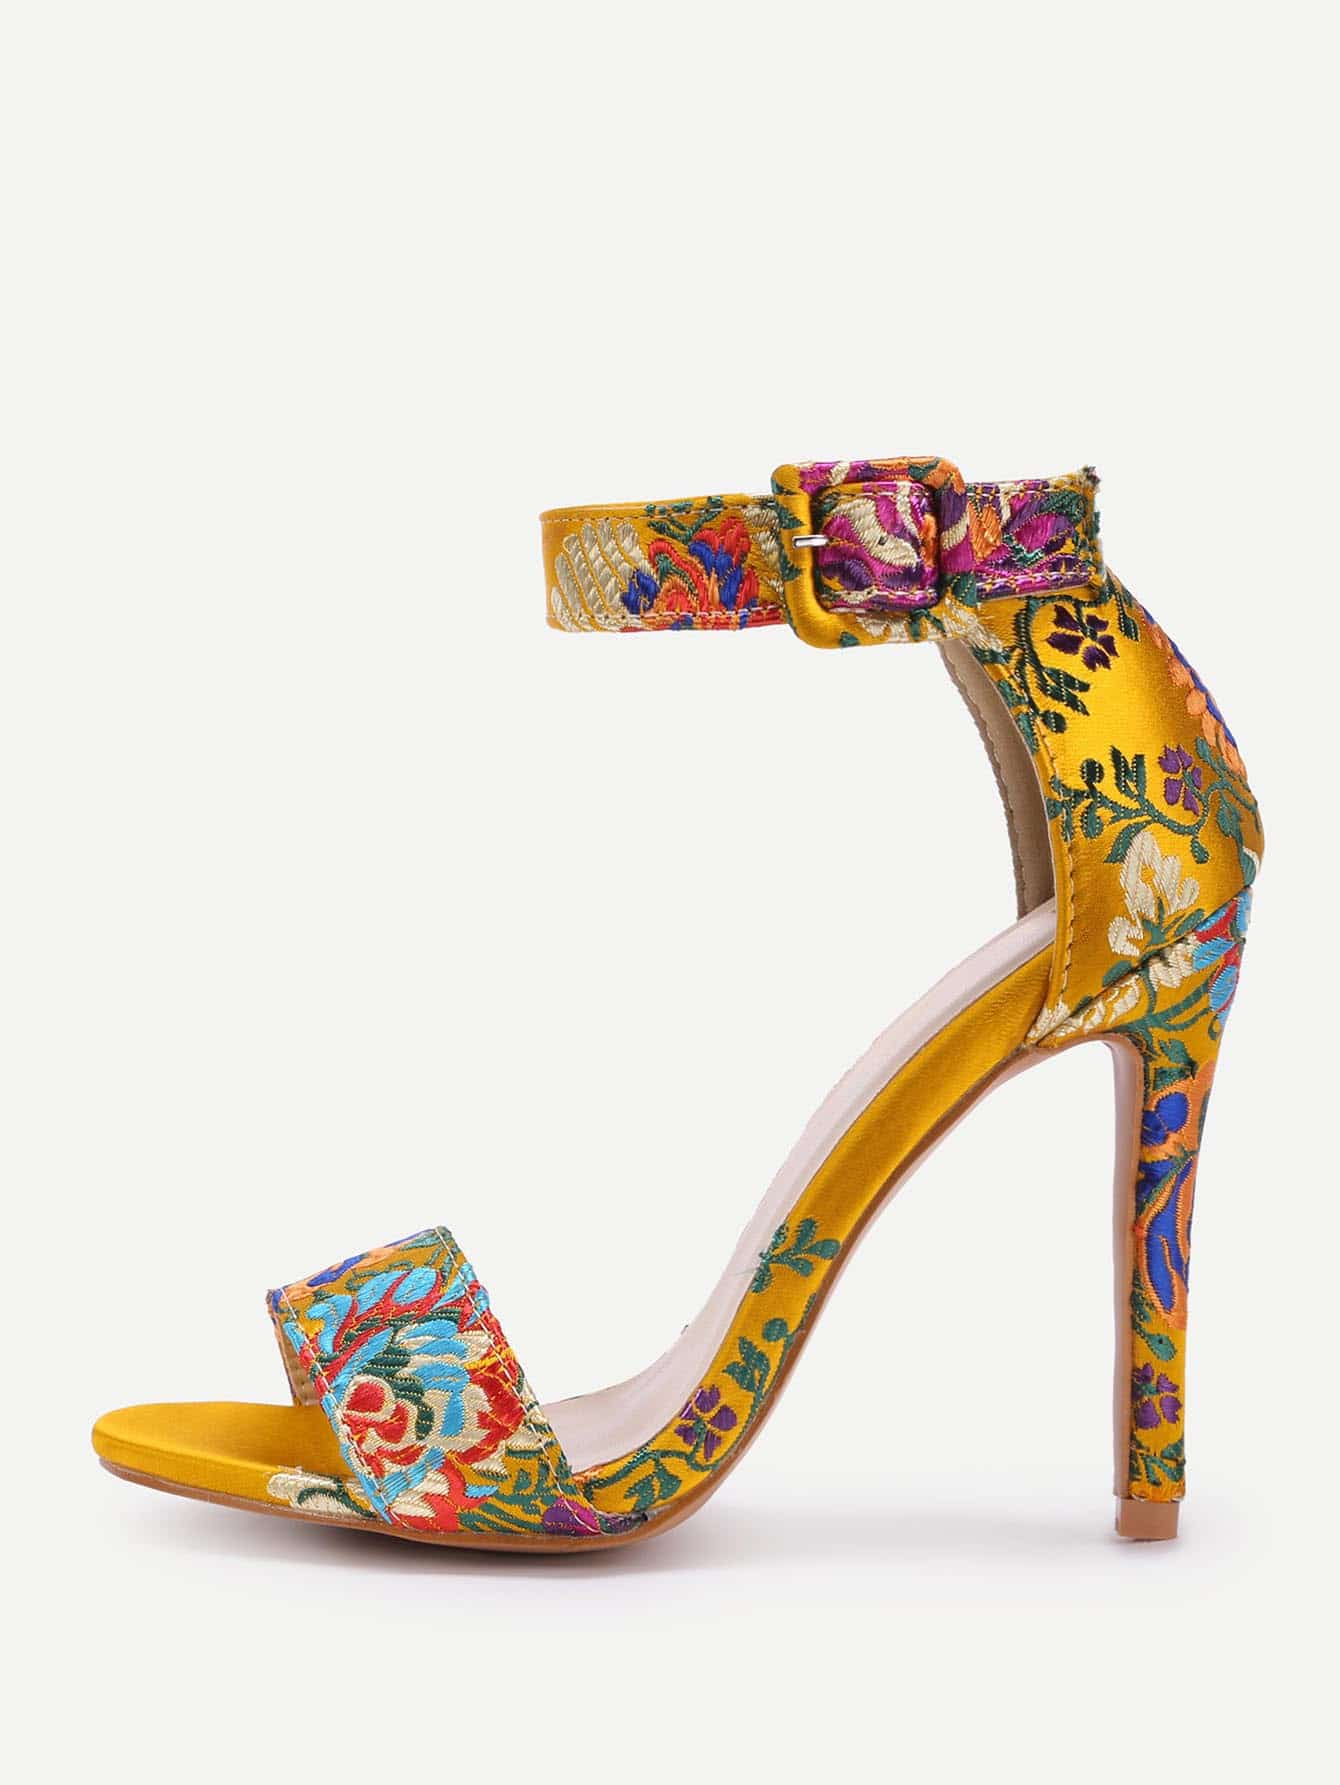 Flower Pattern Ankle Strap High Heel Sandals shoes170825332